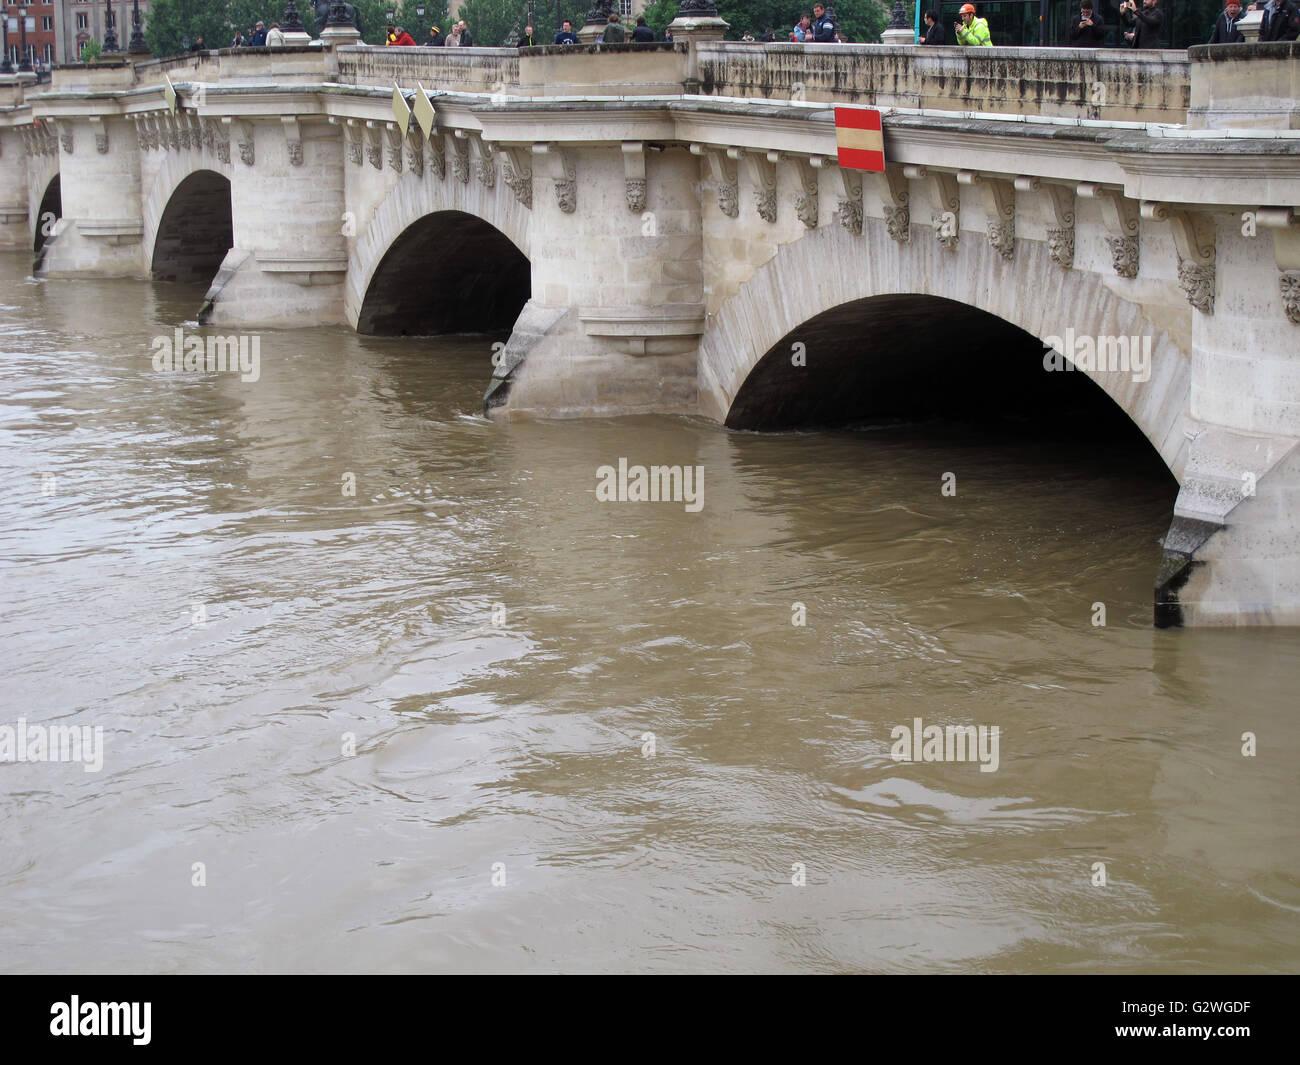 Pont Neuf, flood of the Seine river, June 3, 2016, Paris, France - Stock Image